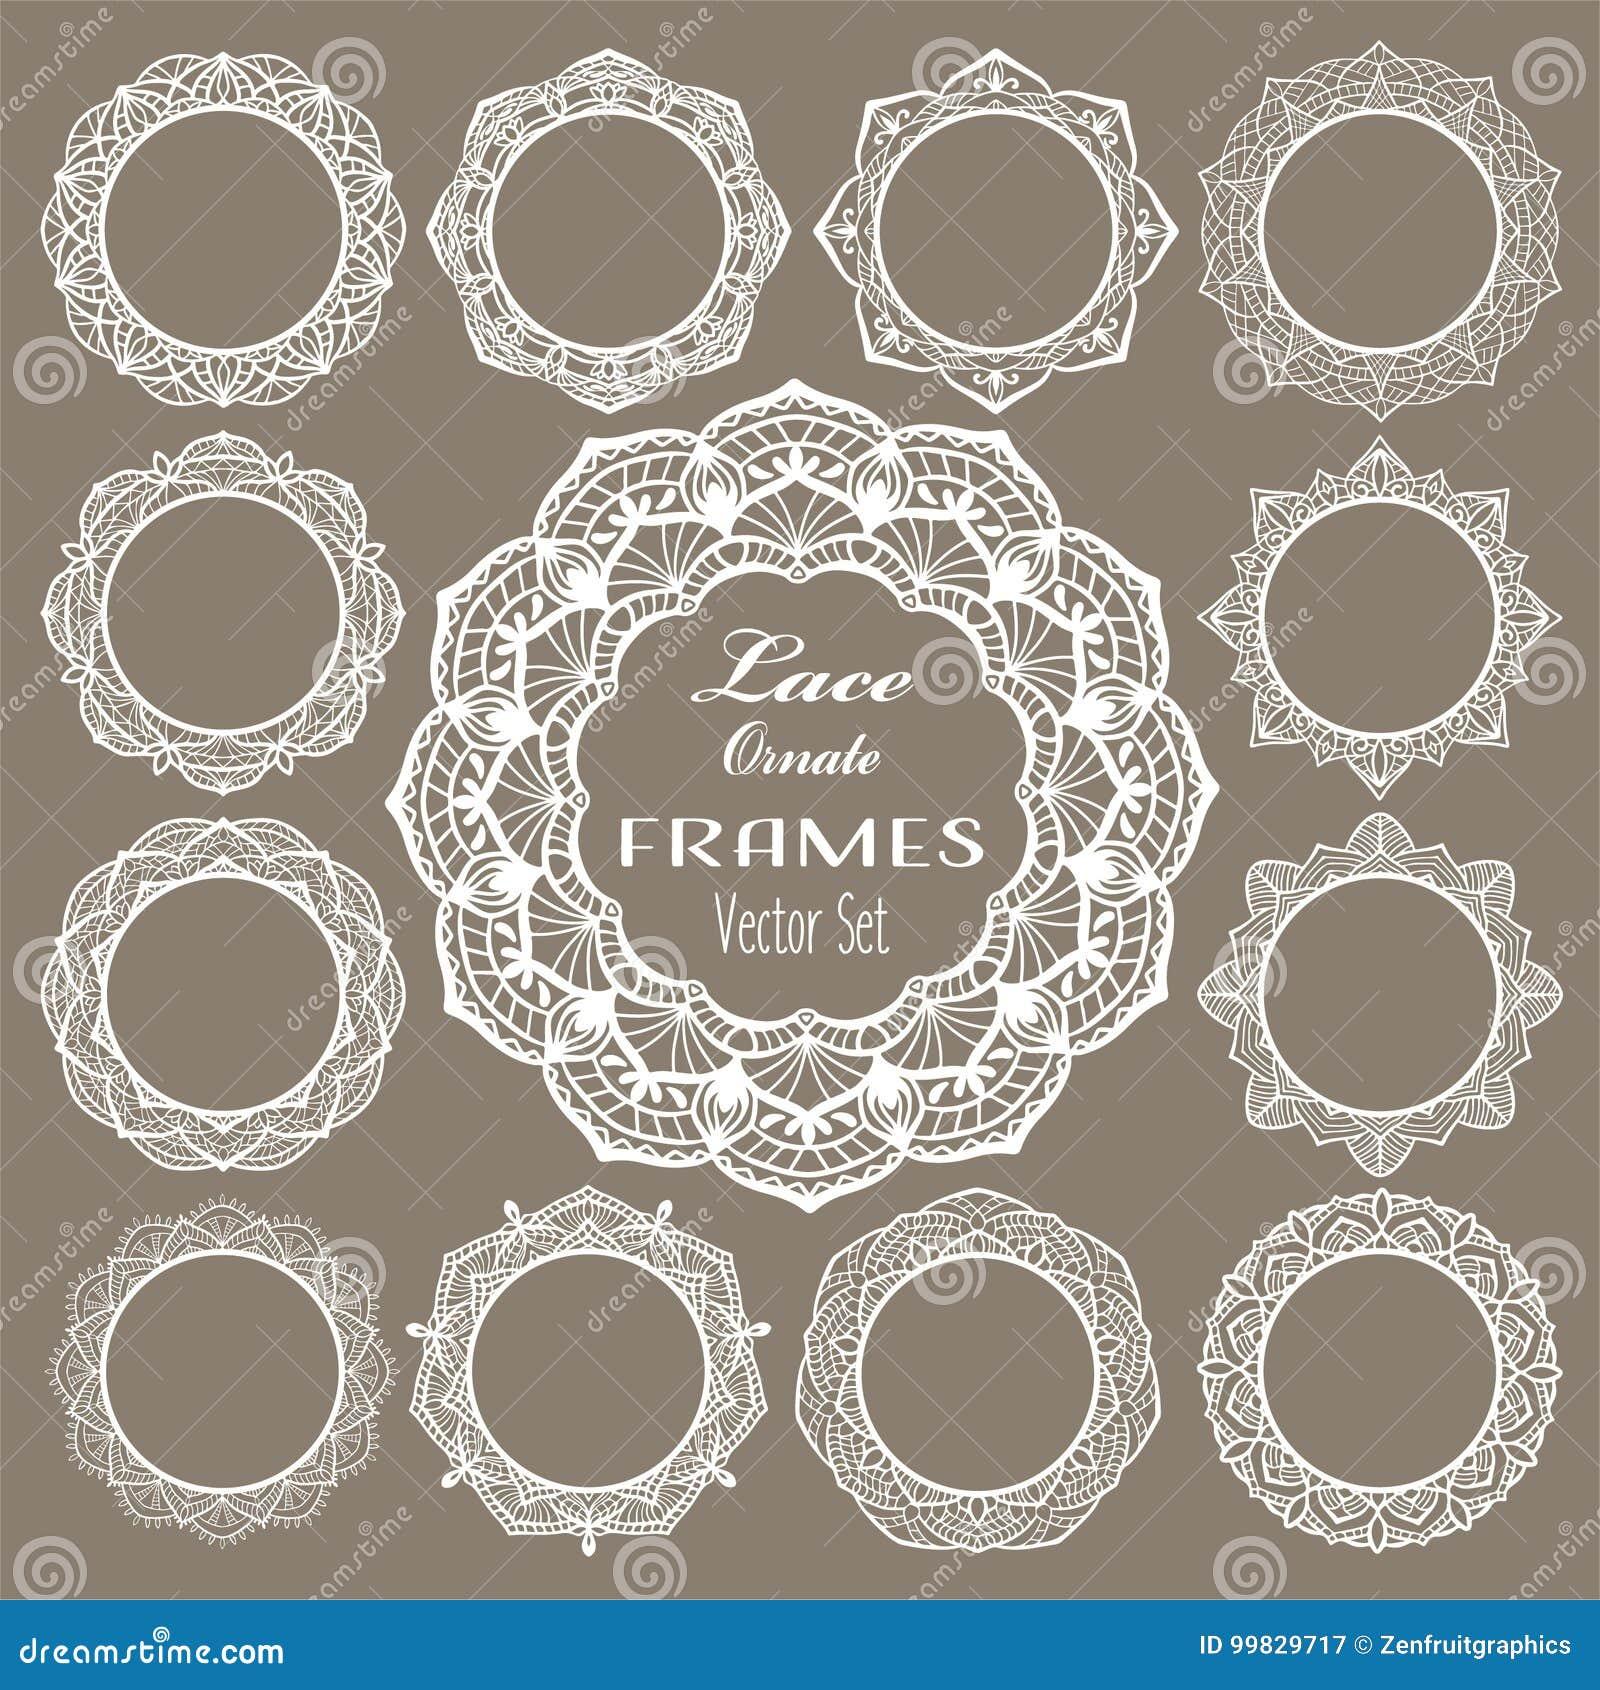 Round vintage lace frames, white napkins for elegant wedding invitation card, text or photo. Laser cut set, round mandala ornament